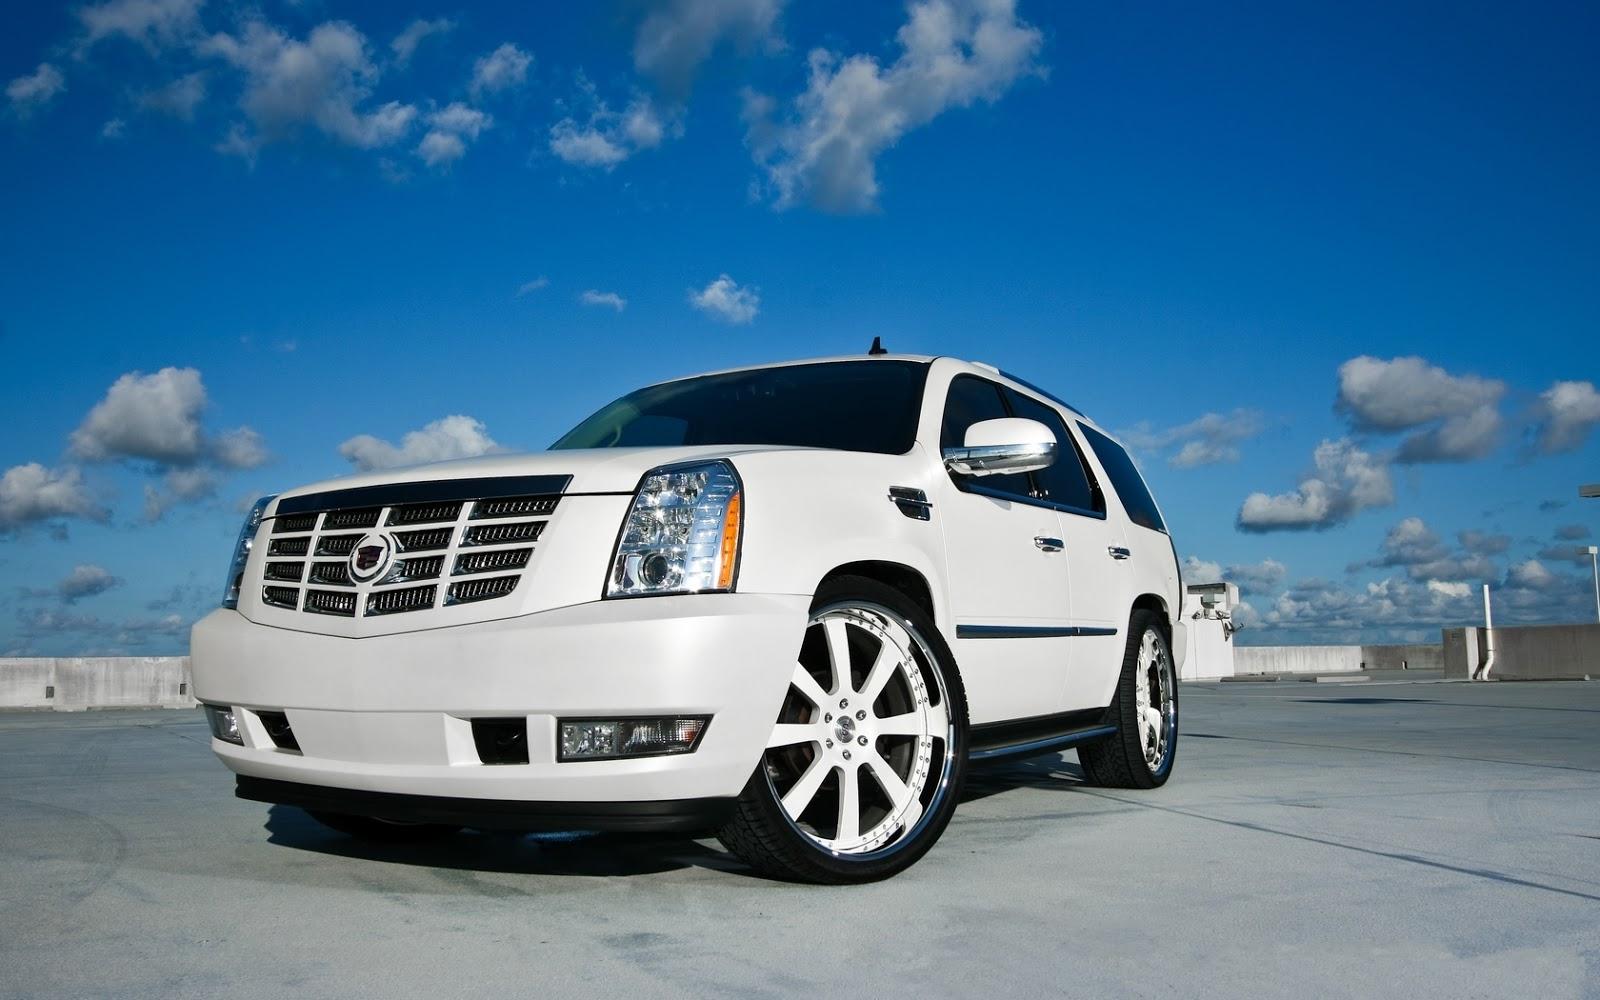 HD Car Wallpapers: Cadillac Escalade Wallpaper HD